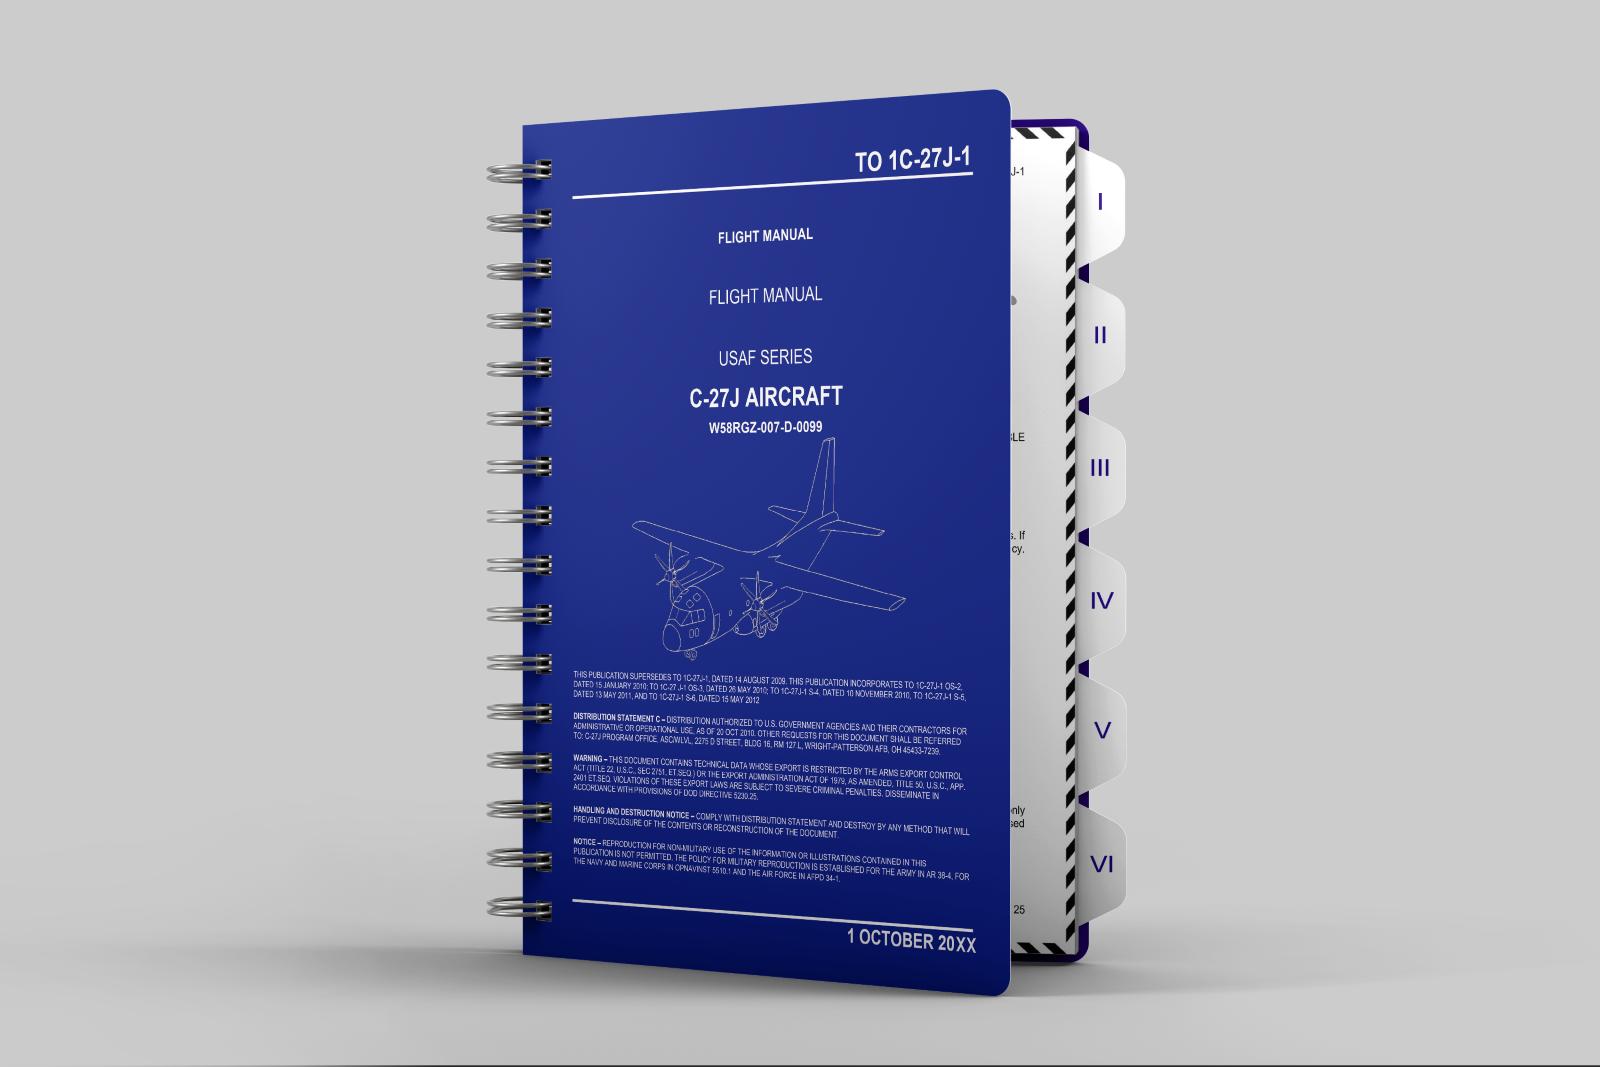 Sample Tech Manual Cover